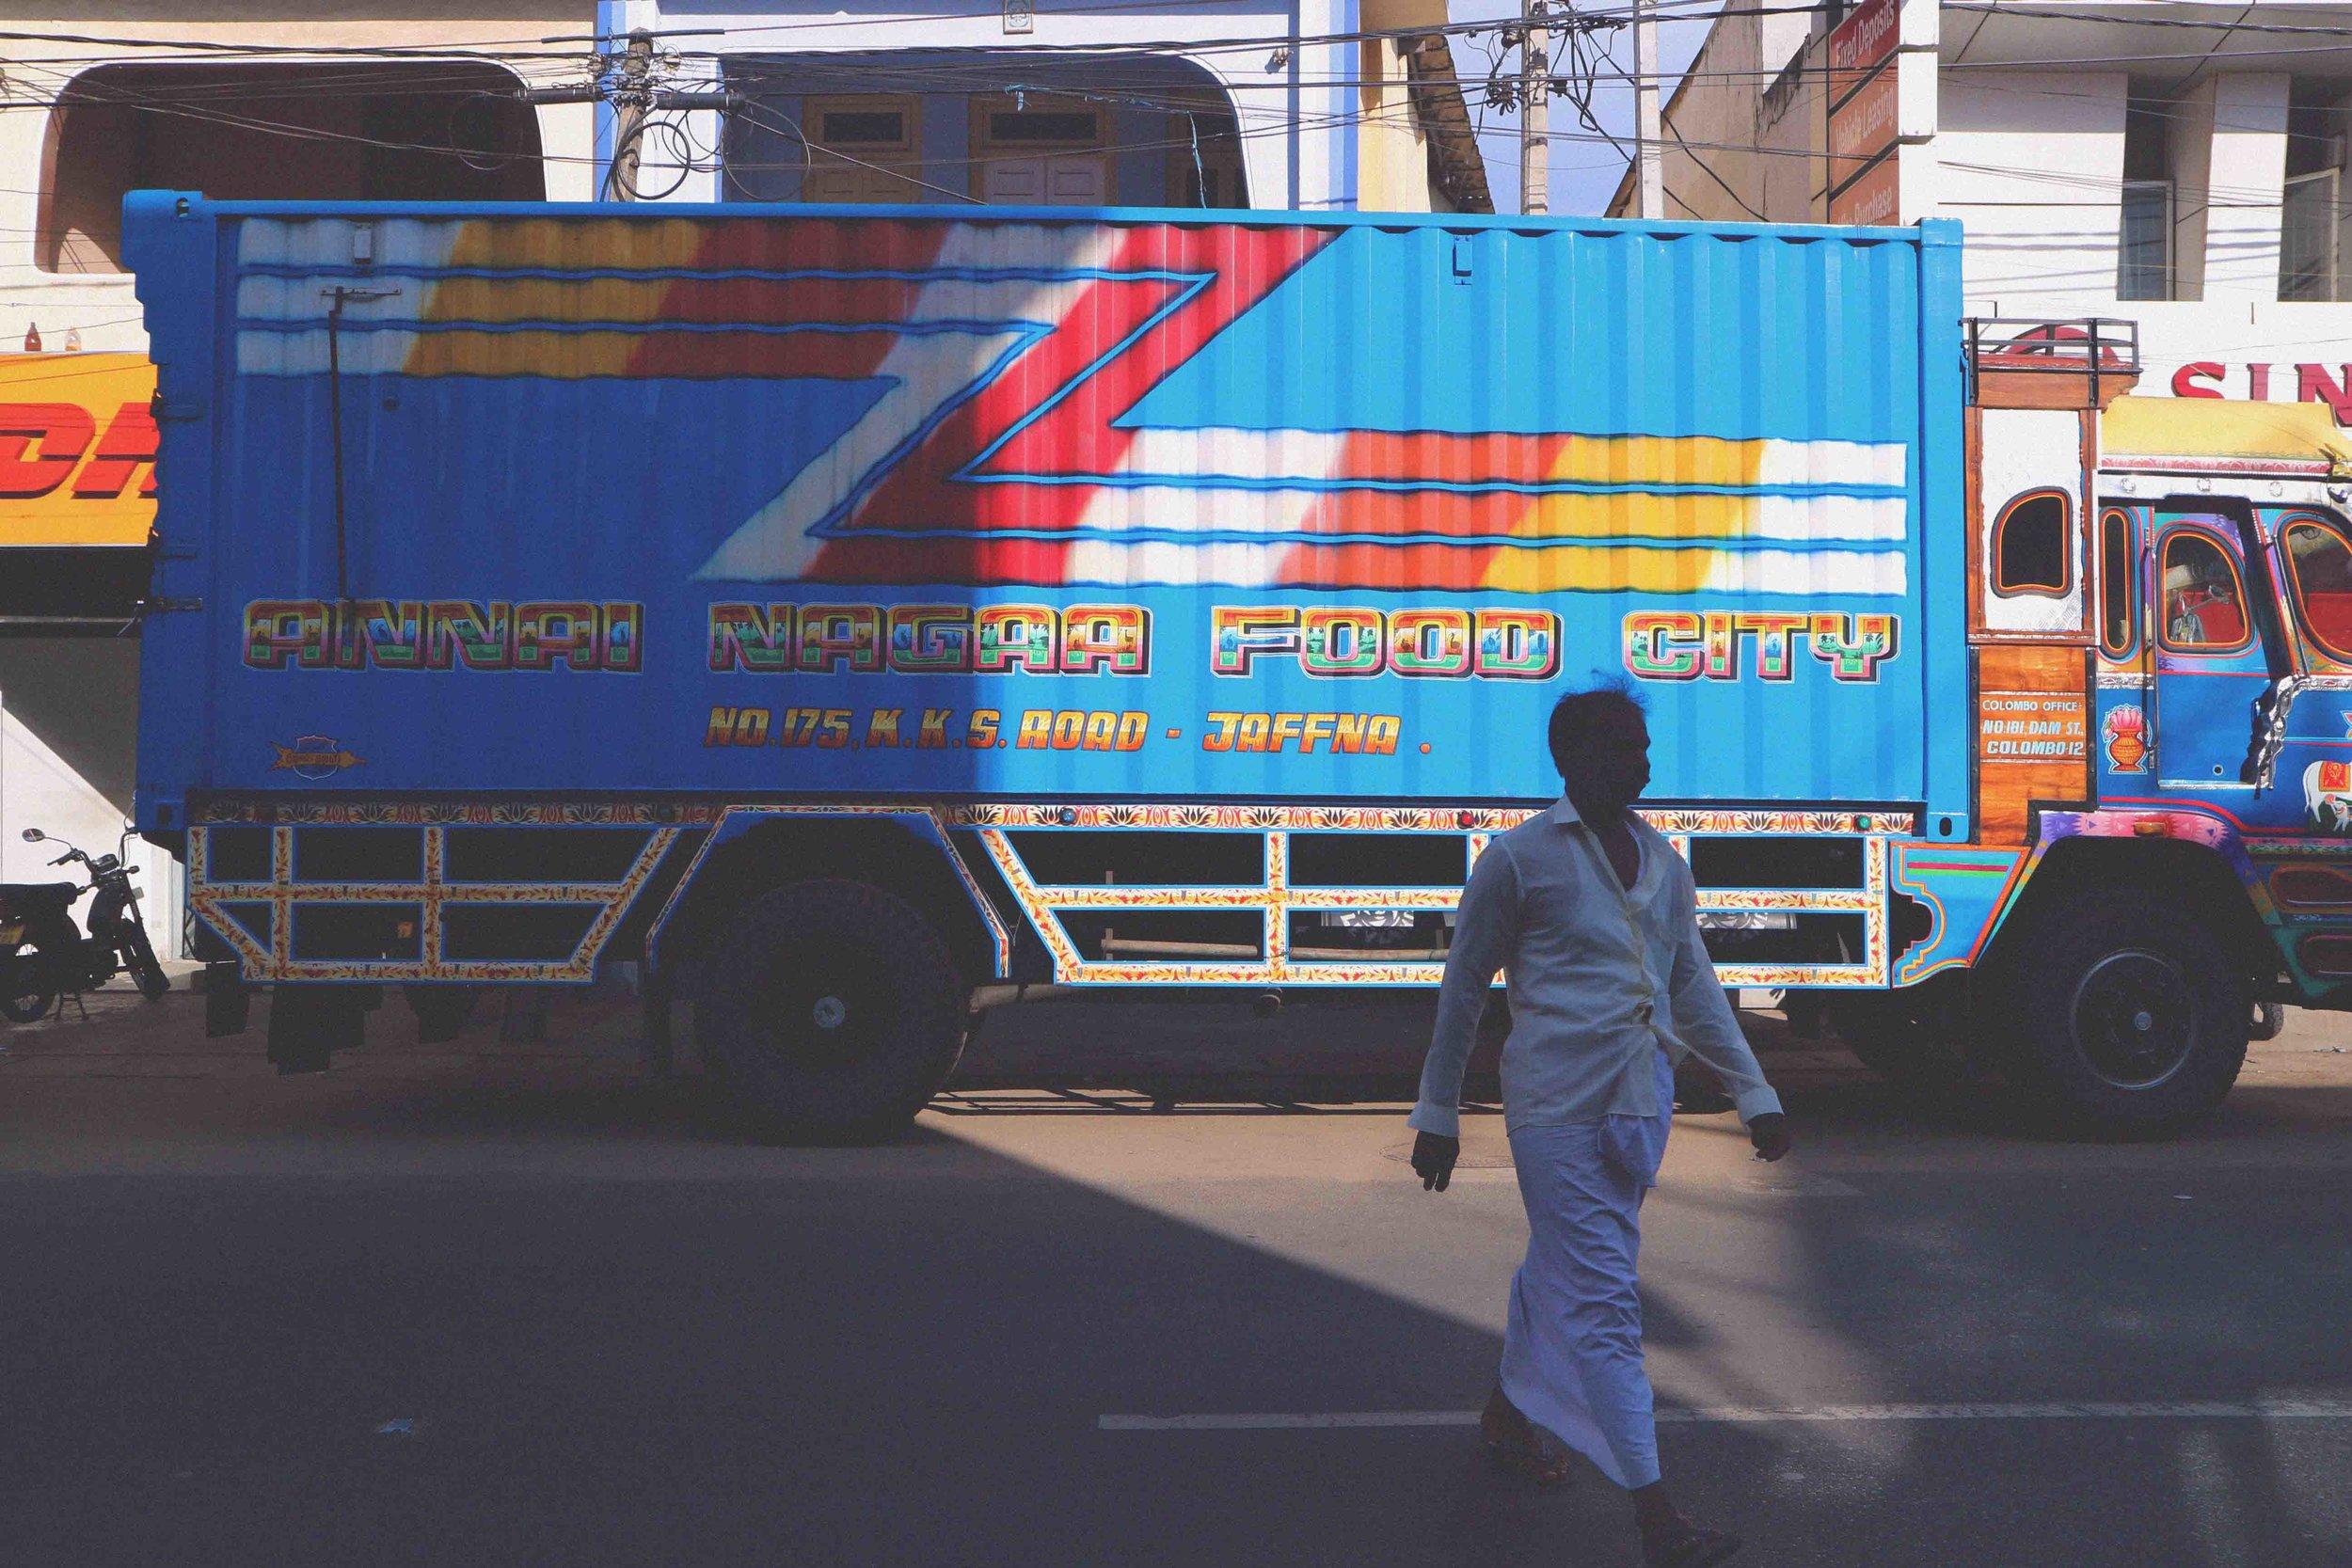 Annai Nagaa Food City Truck in Jaffna